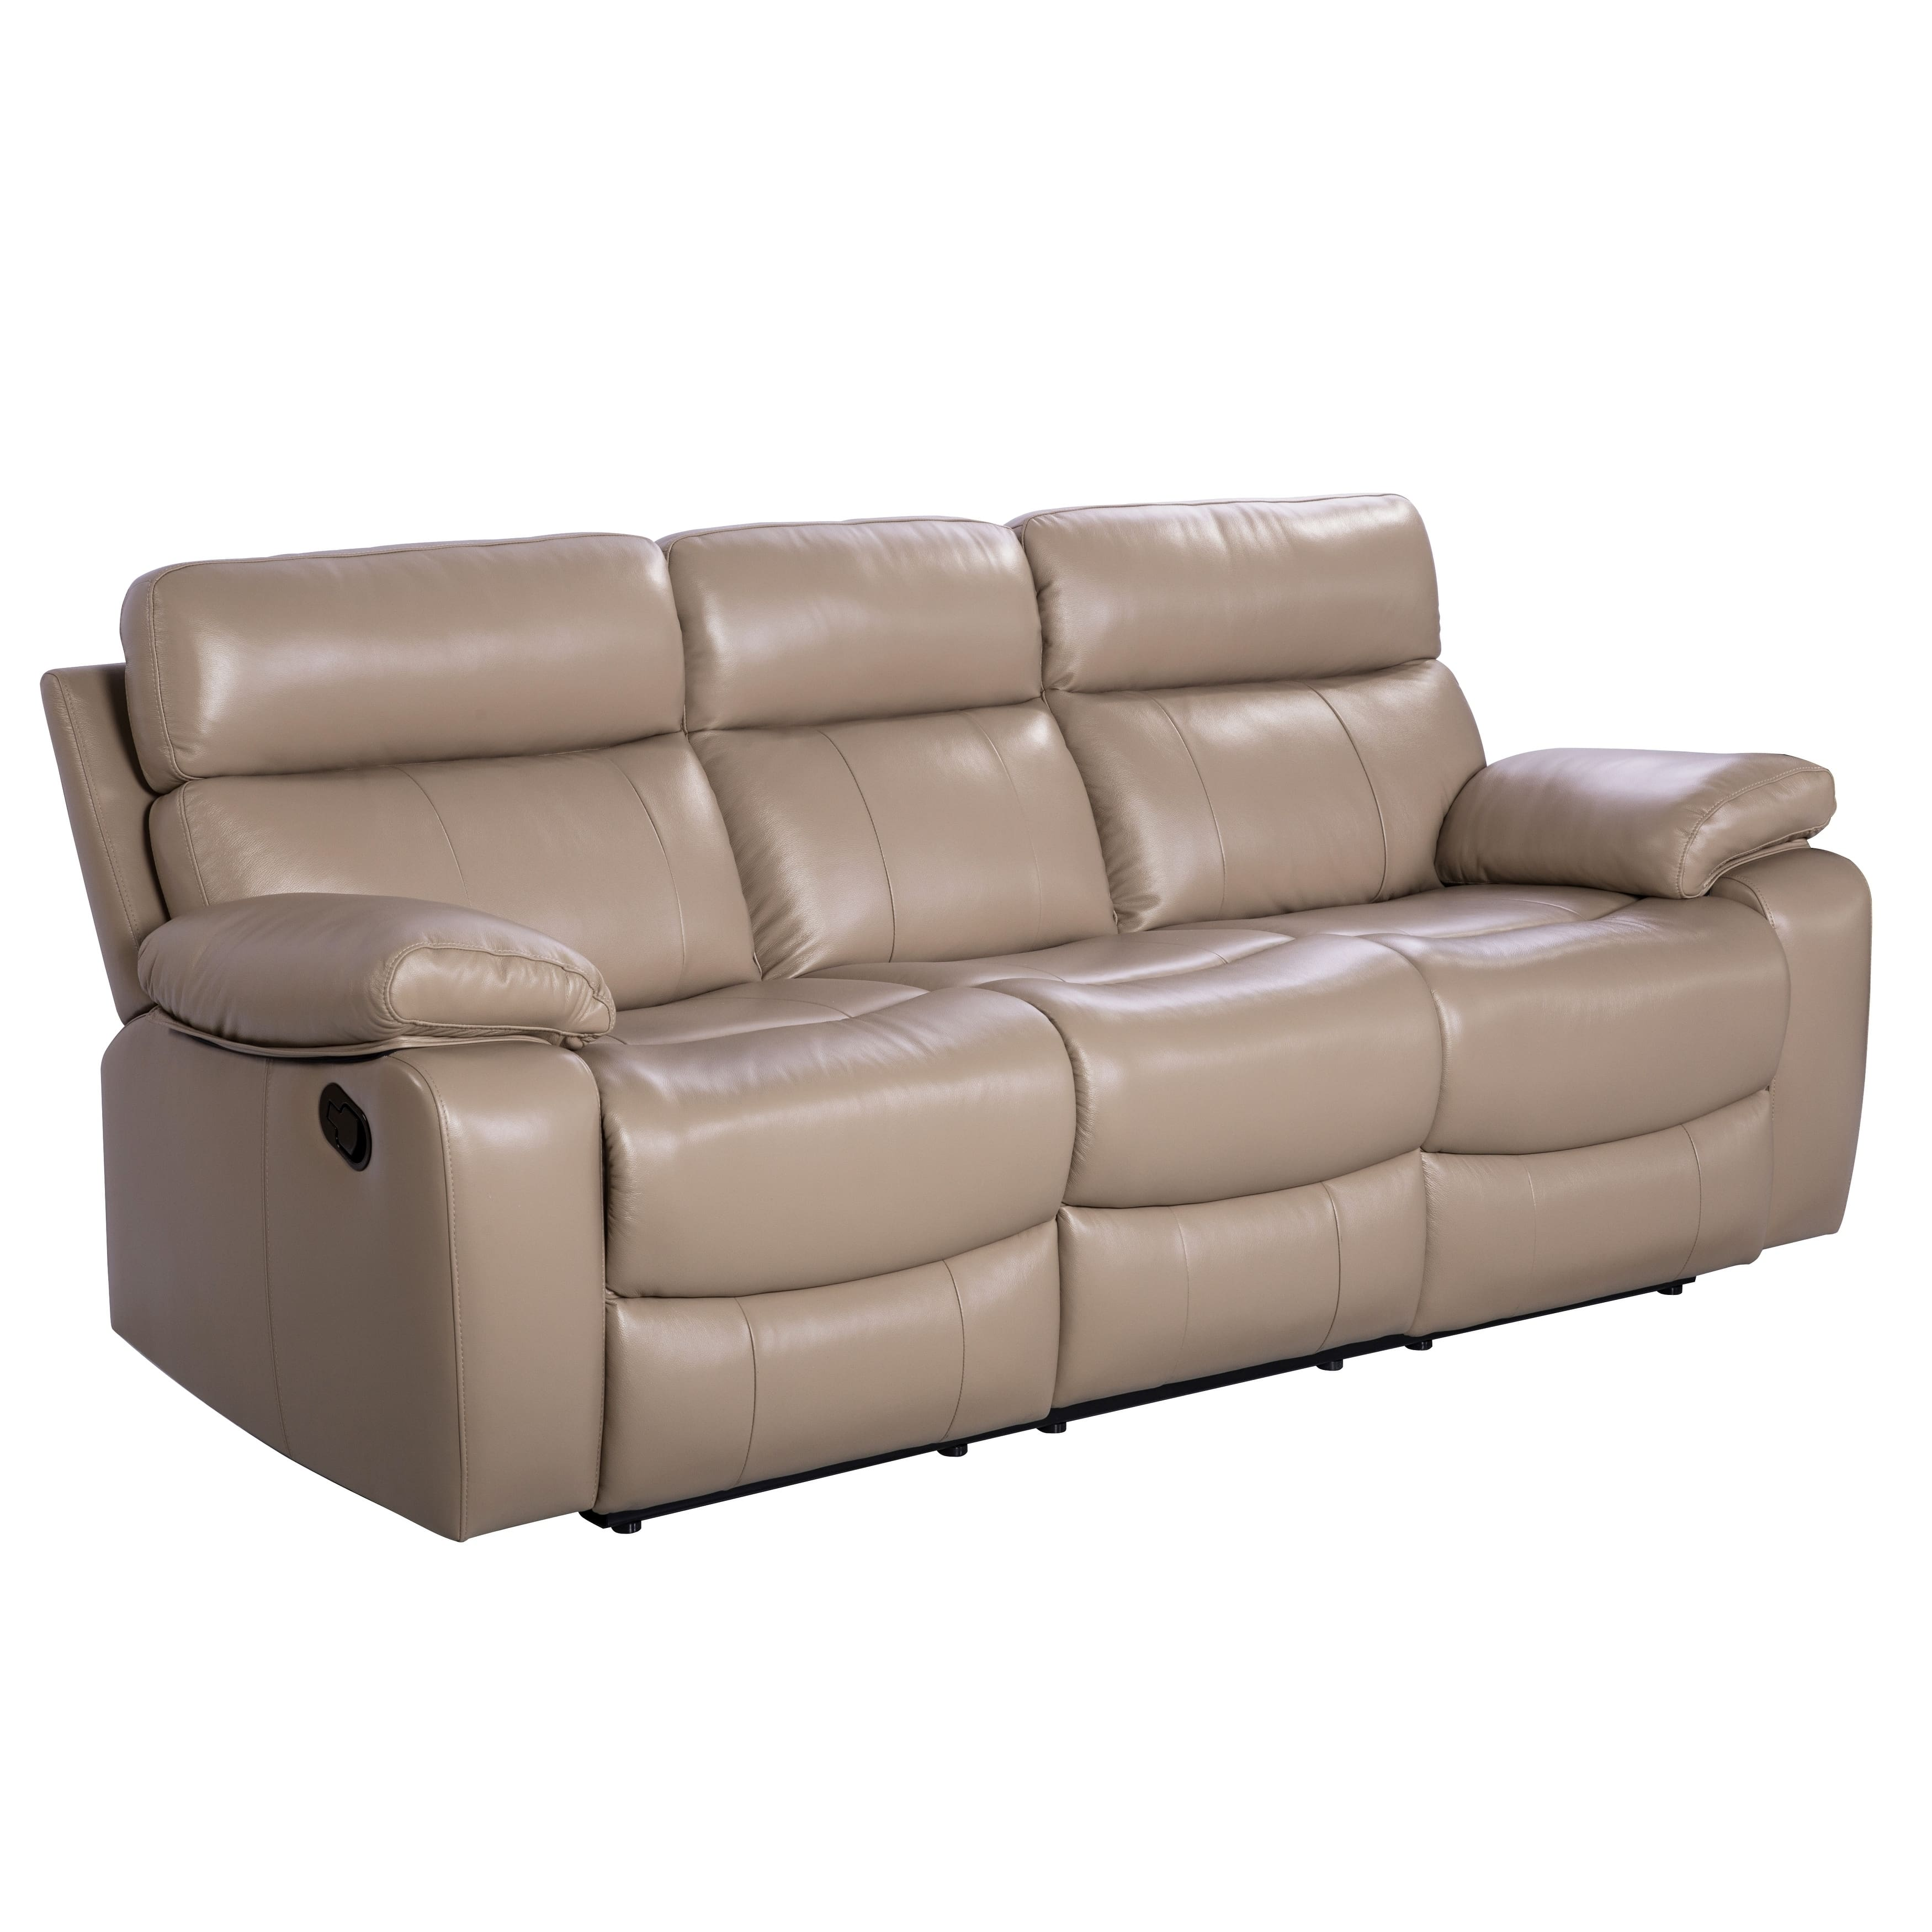 Living Room Furniture Deals